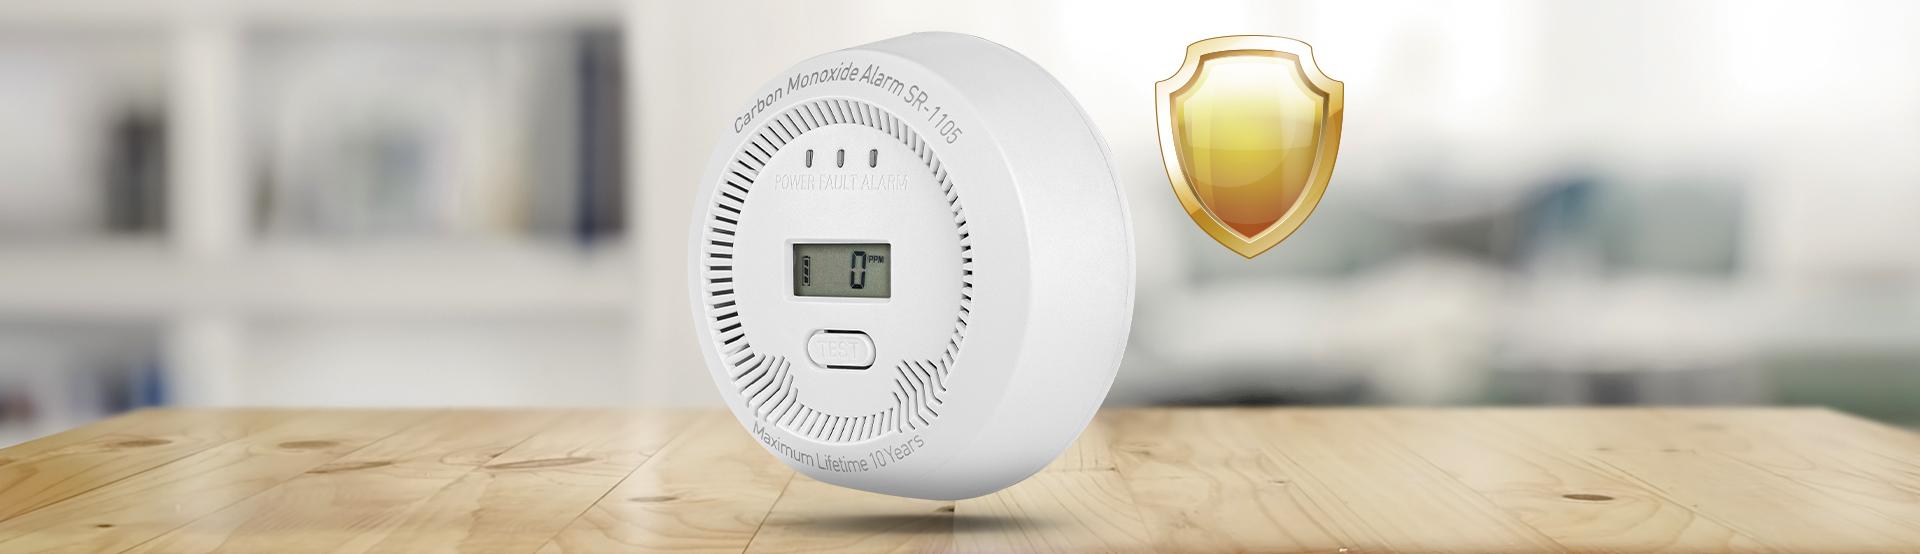 co (carbon monoxide) detector lanberg indoor +bulit-in thermometer 5